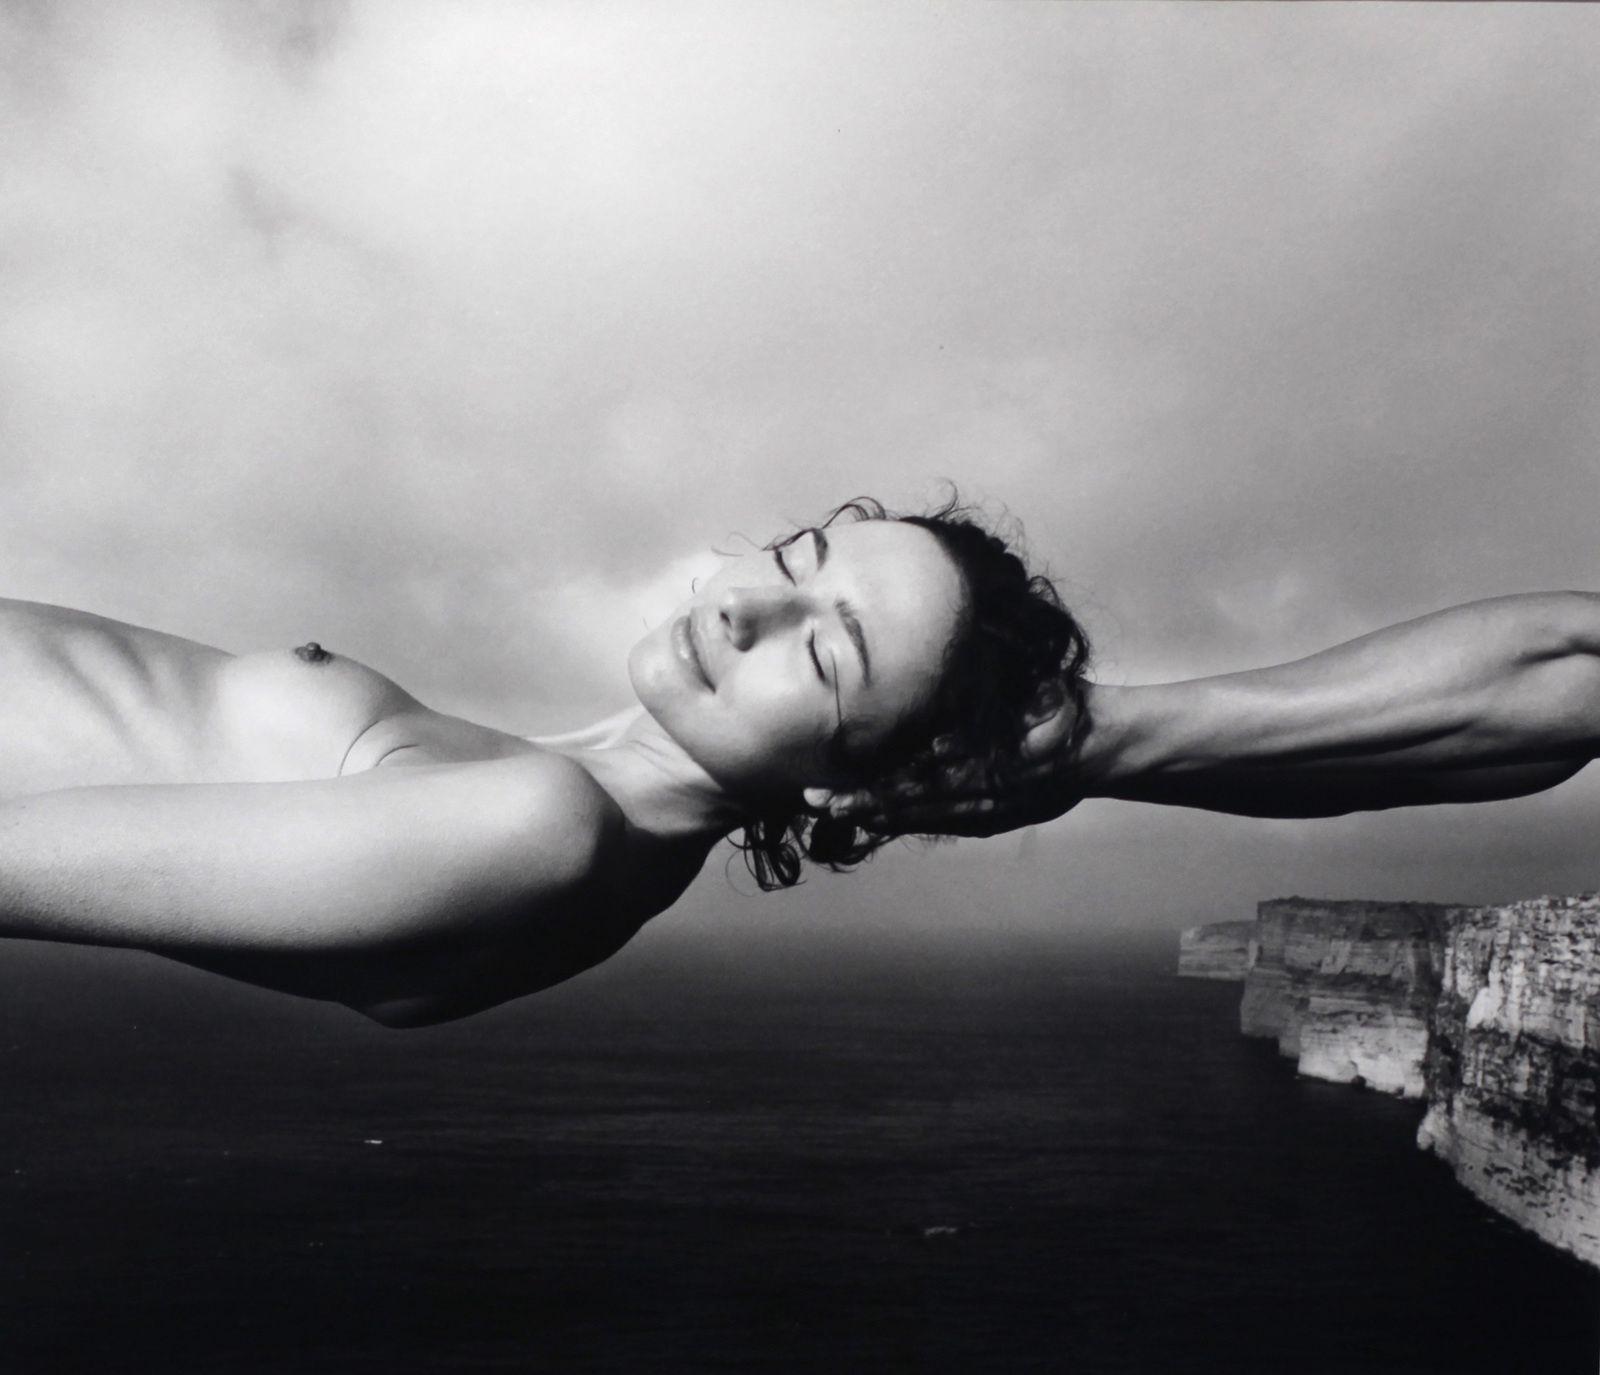 """Laurence, Ta 'Cenc, Gozo, Malta"", 2002 d'Arno Rafael MINKKINEN - Courtesy Galerie Camera Obscura© Photo Éric Simon"